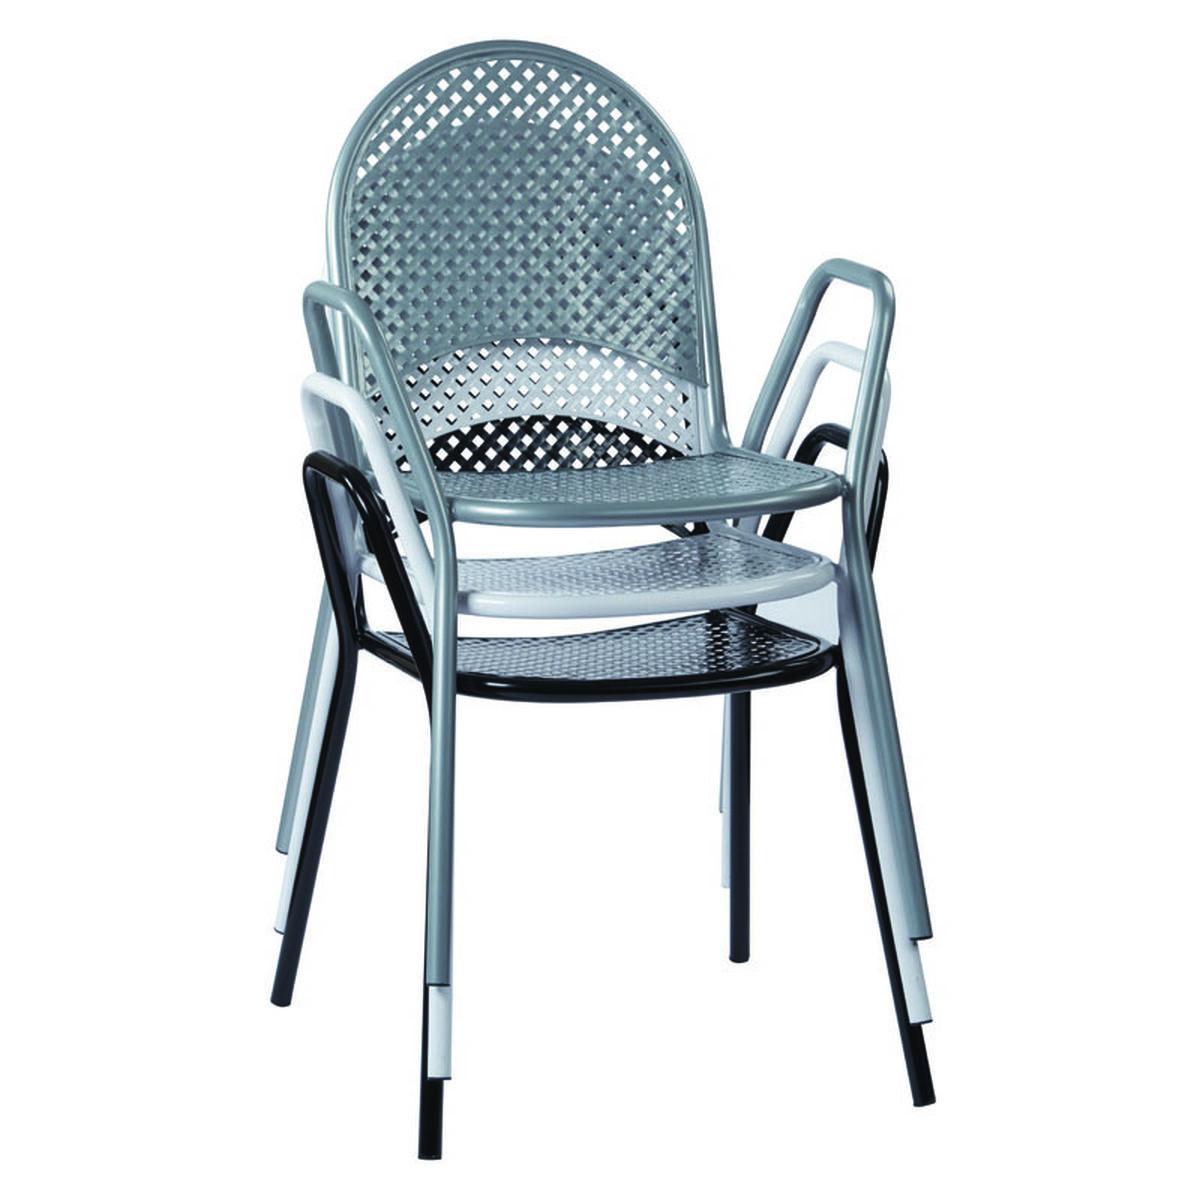 set of 2 work smart stack chair stc18a2 11. Black Bedroom Furniture Sets. Home Design Ideas